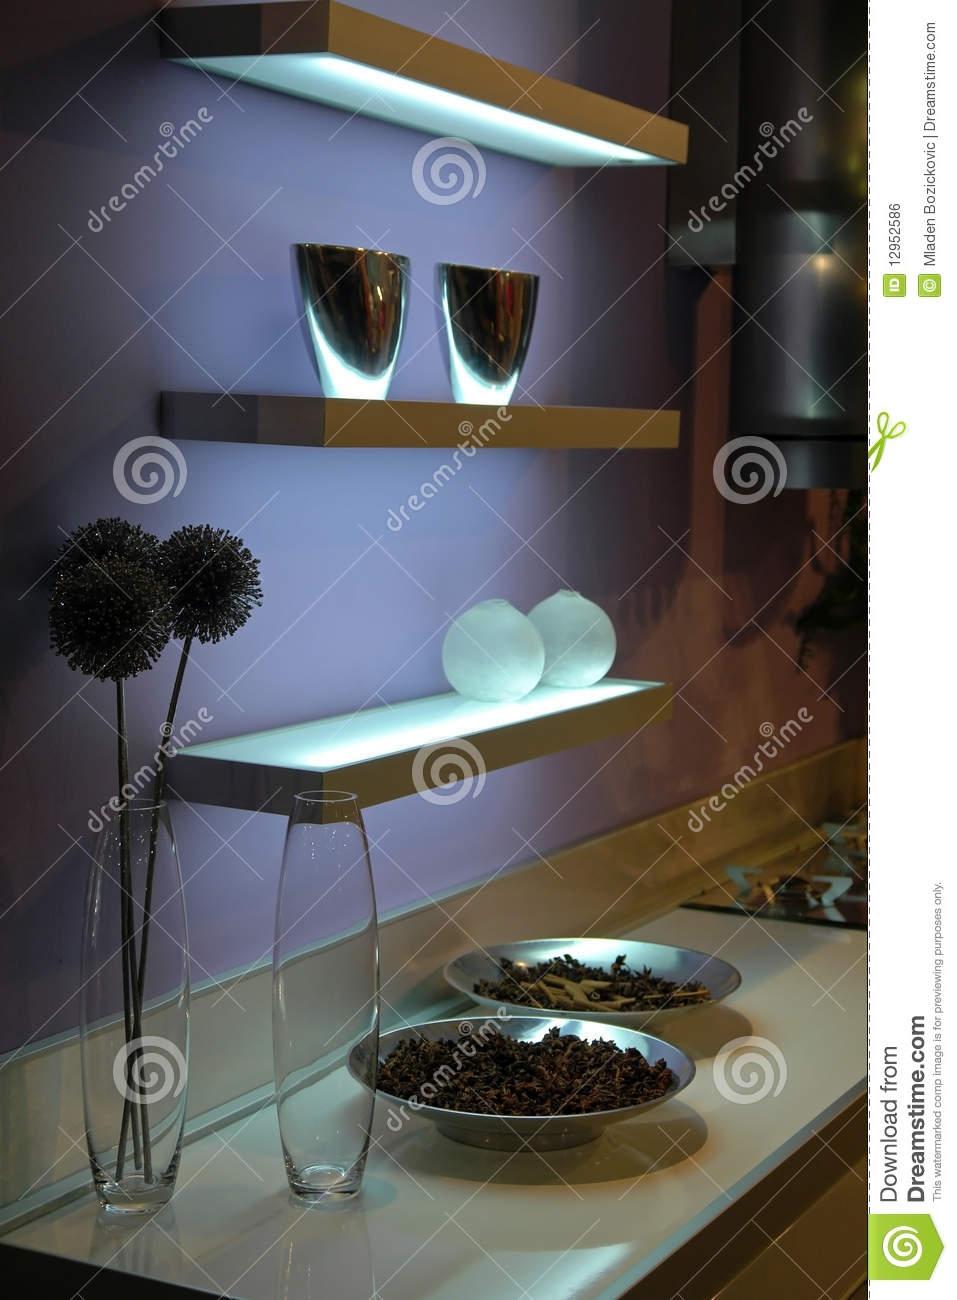 Illuminated Glass Shelves Royalty Free Stock Image Image 12952586 With Illuminated Glass Shelves (View 15 of 15)